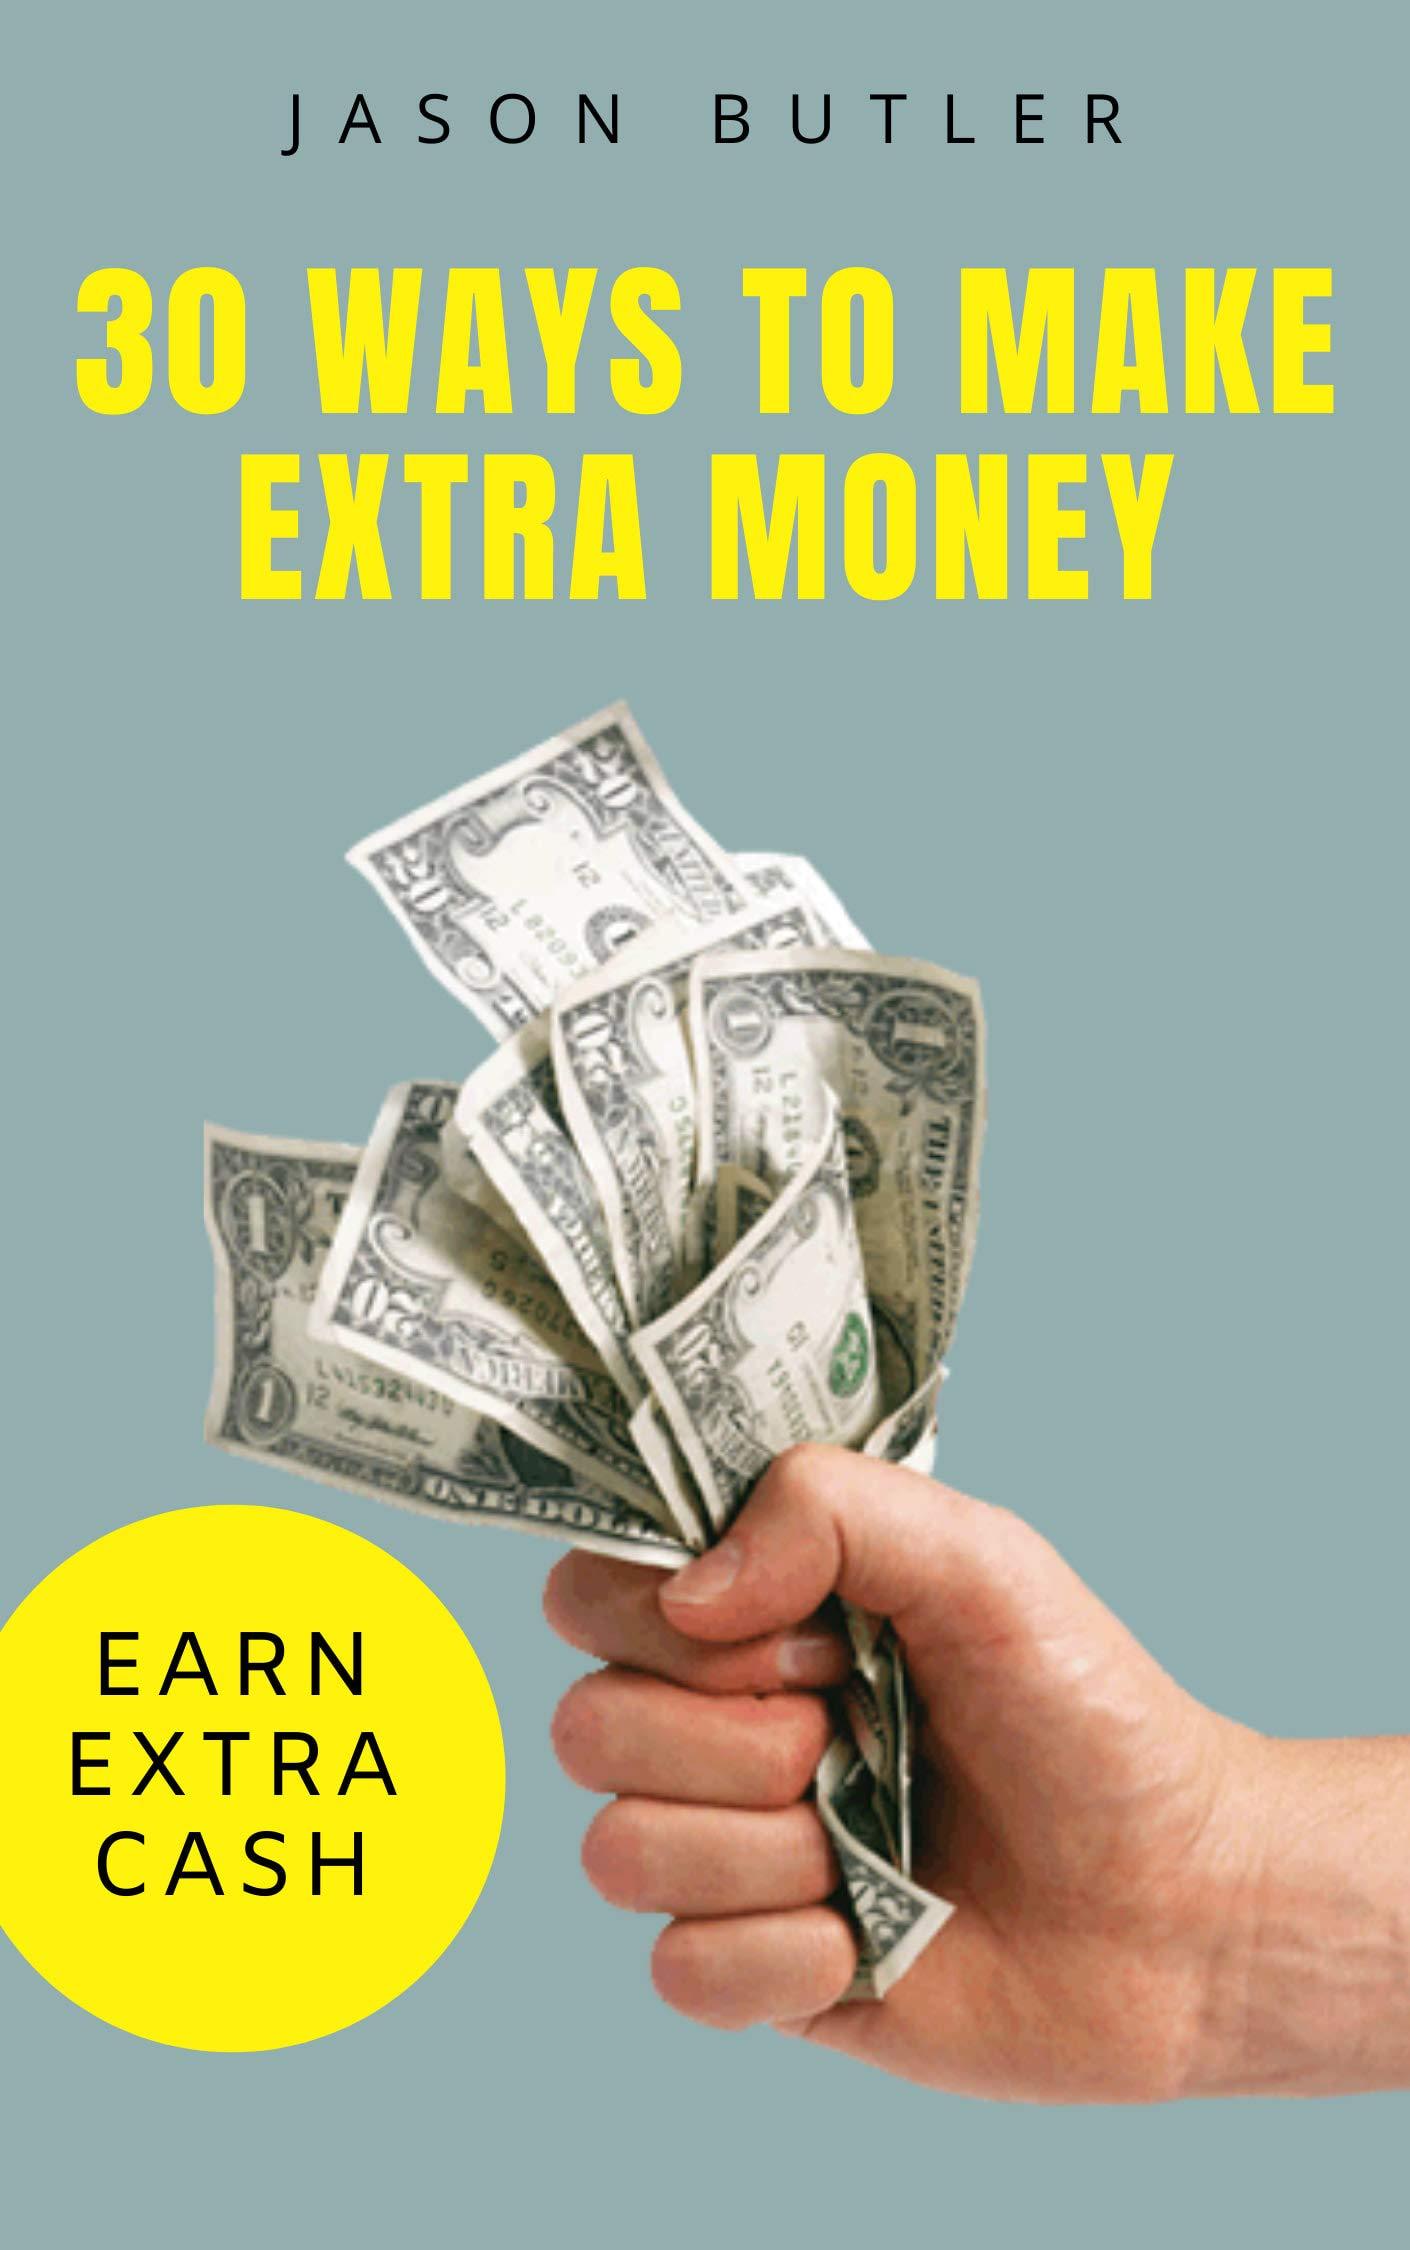 30 Ways to Make Extra Money